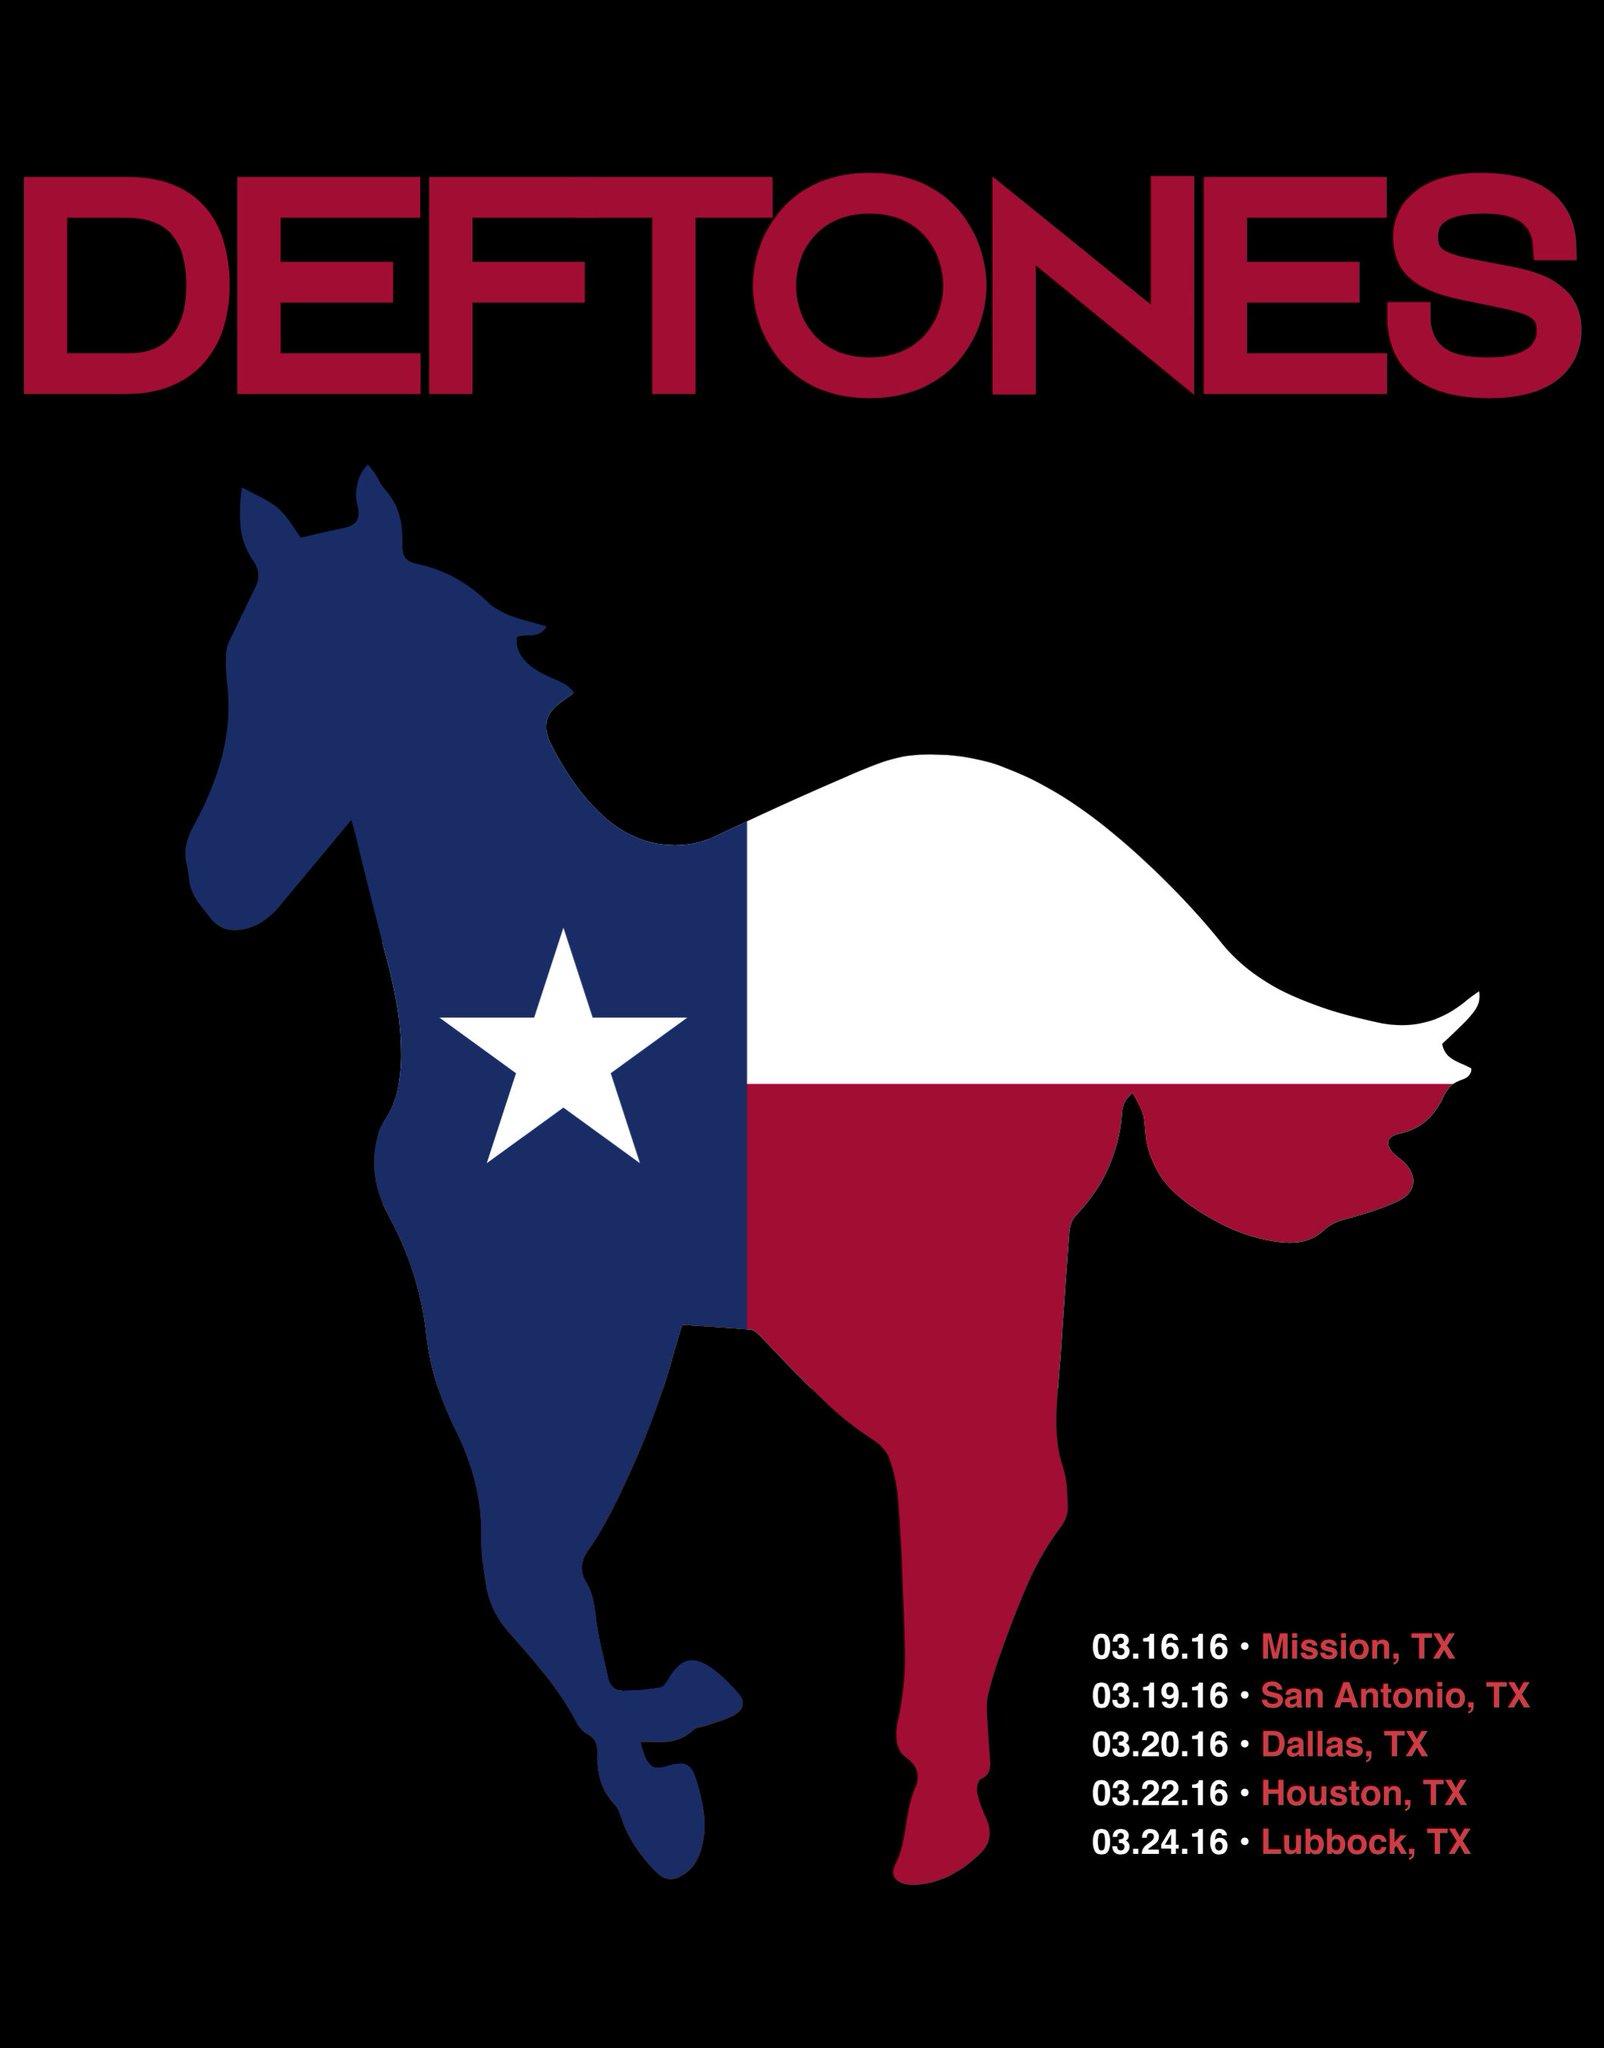 Shirt design mission tx - Deftones On Twitter Deftones Return To Texas In March Tix On Sale Fri Go To Https T Co Hsewpmbotq For Info Https T Co 0egsvvkjci